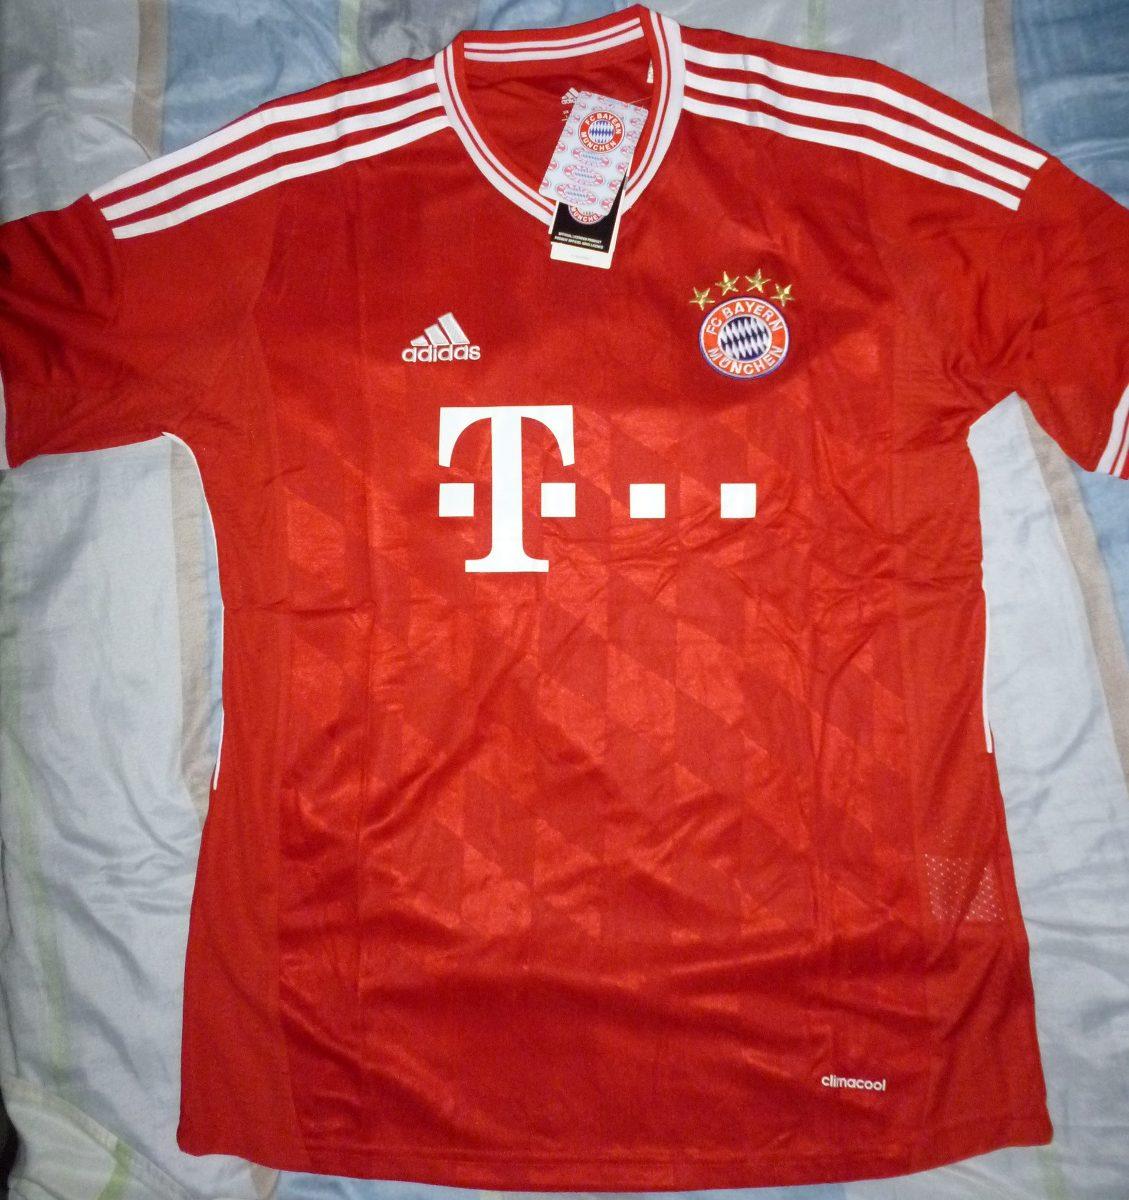 20132014660 Libre Bayern Munich Camiseta En 00 Mercado c4jAq35RLS